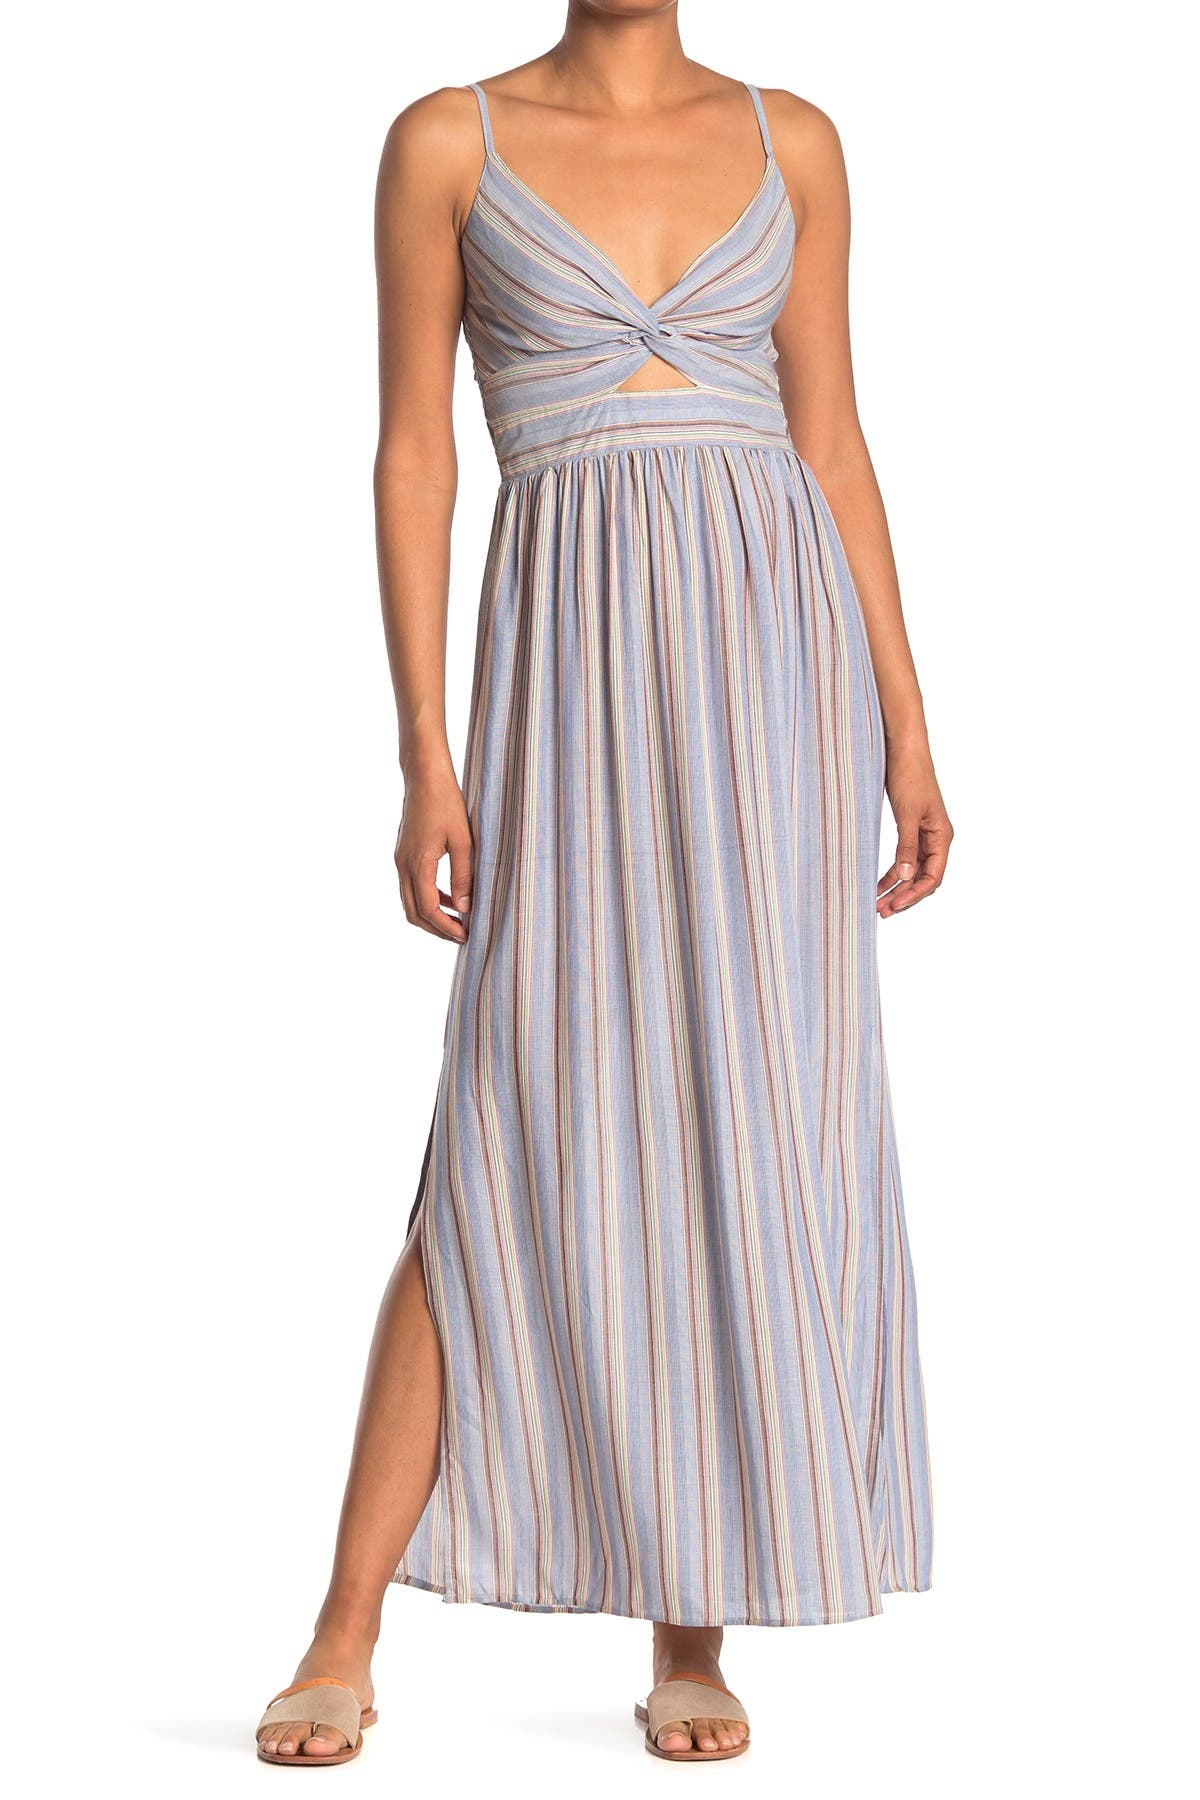 Image of Angie Stripe Print Cutout Maxi Dress